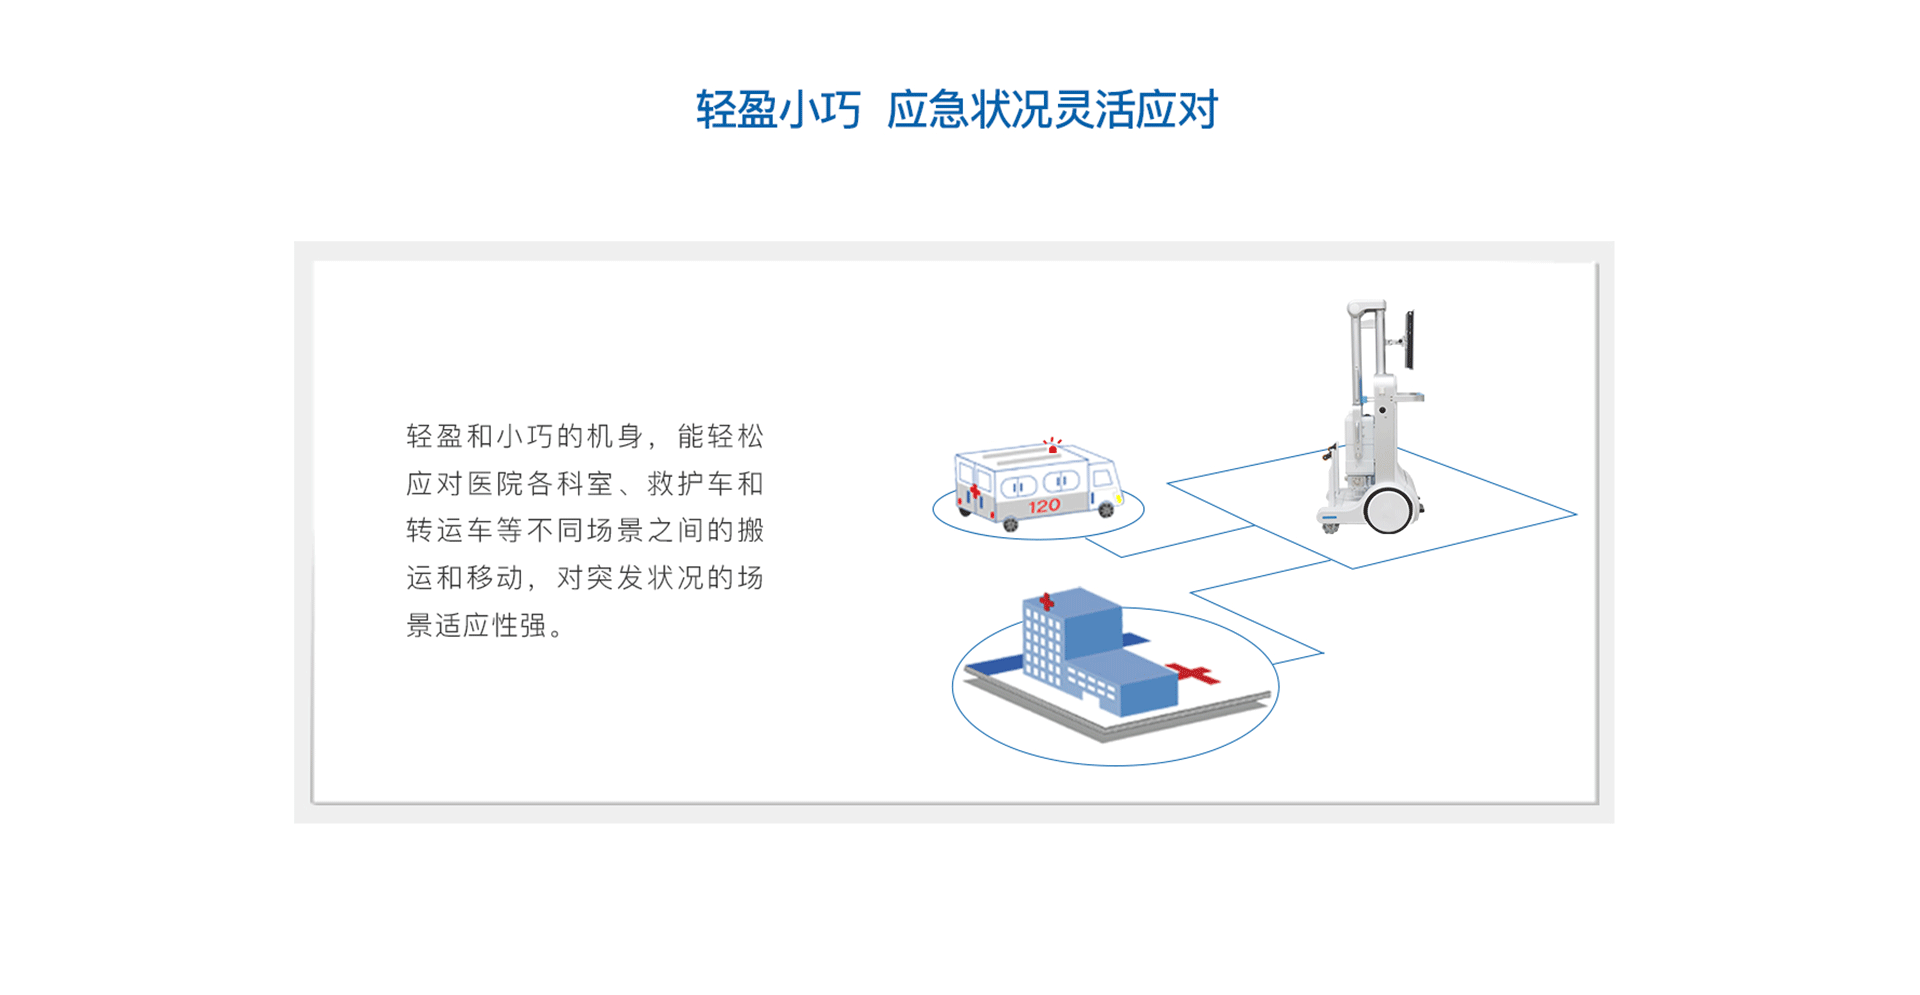 Emer/Neo DR 珍珠